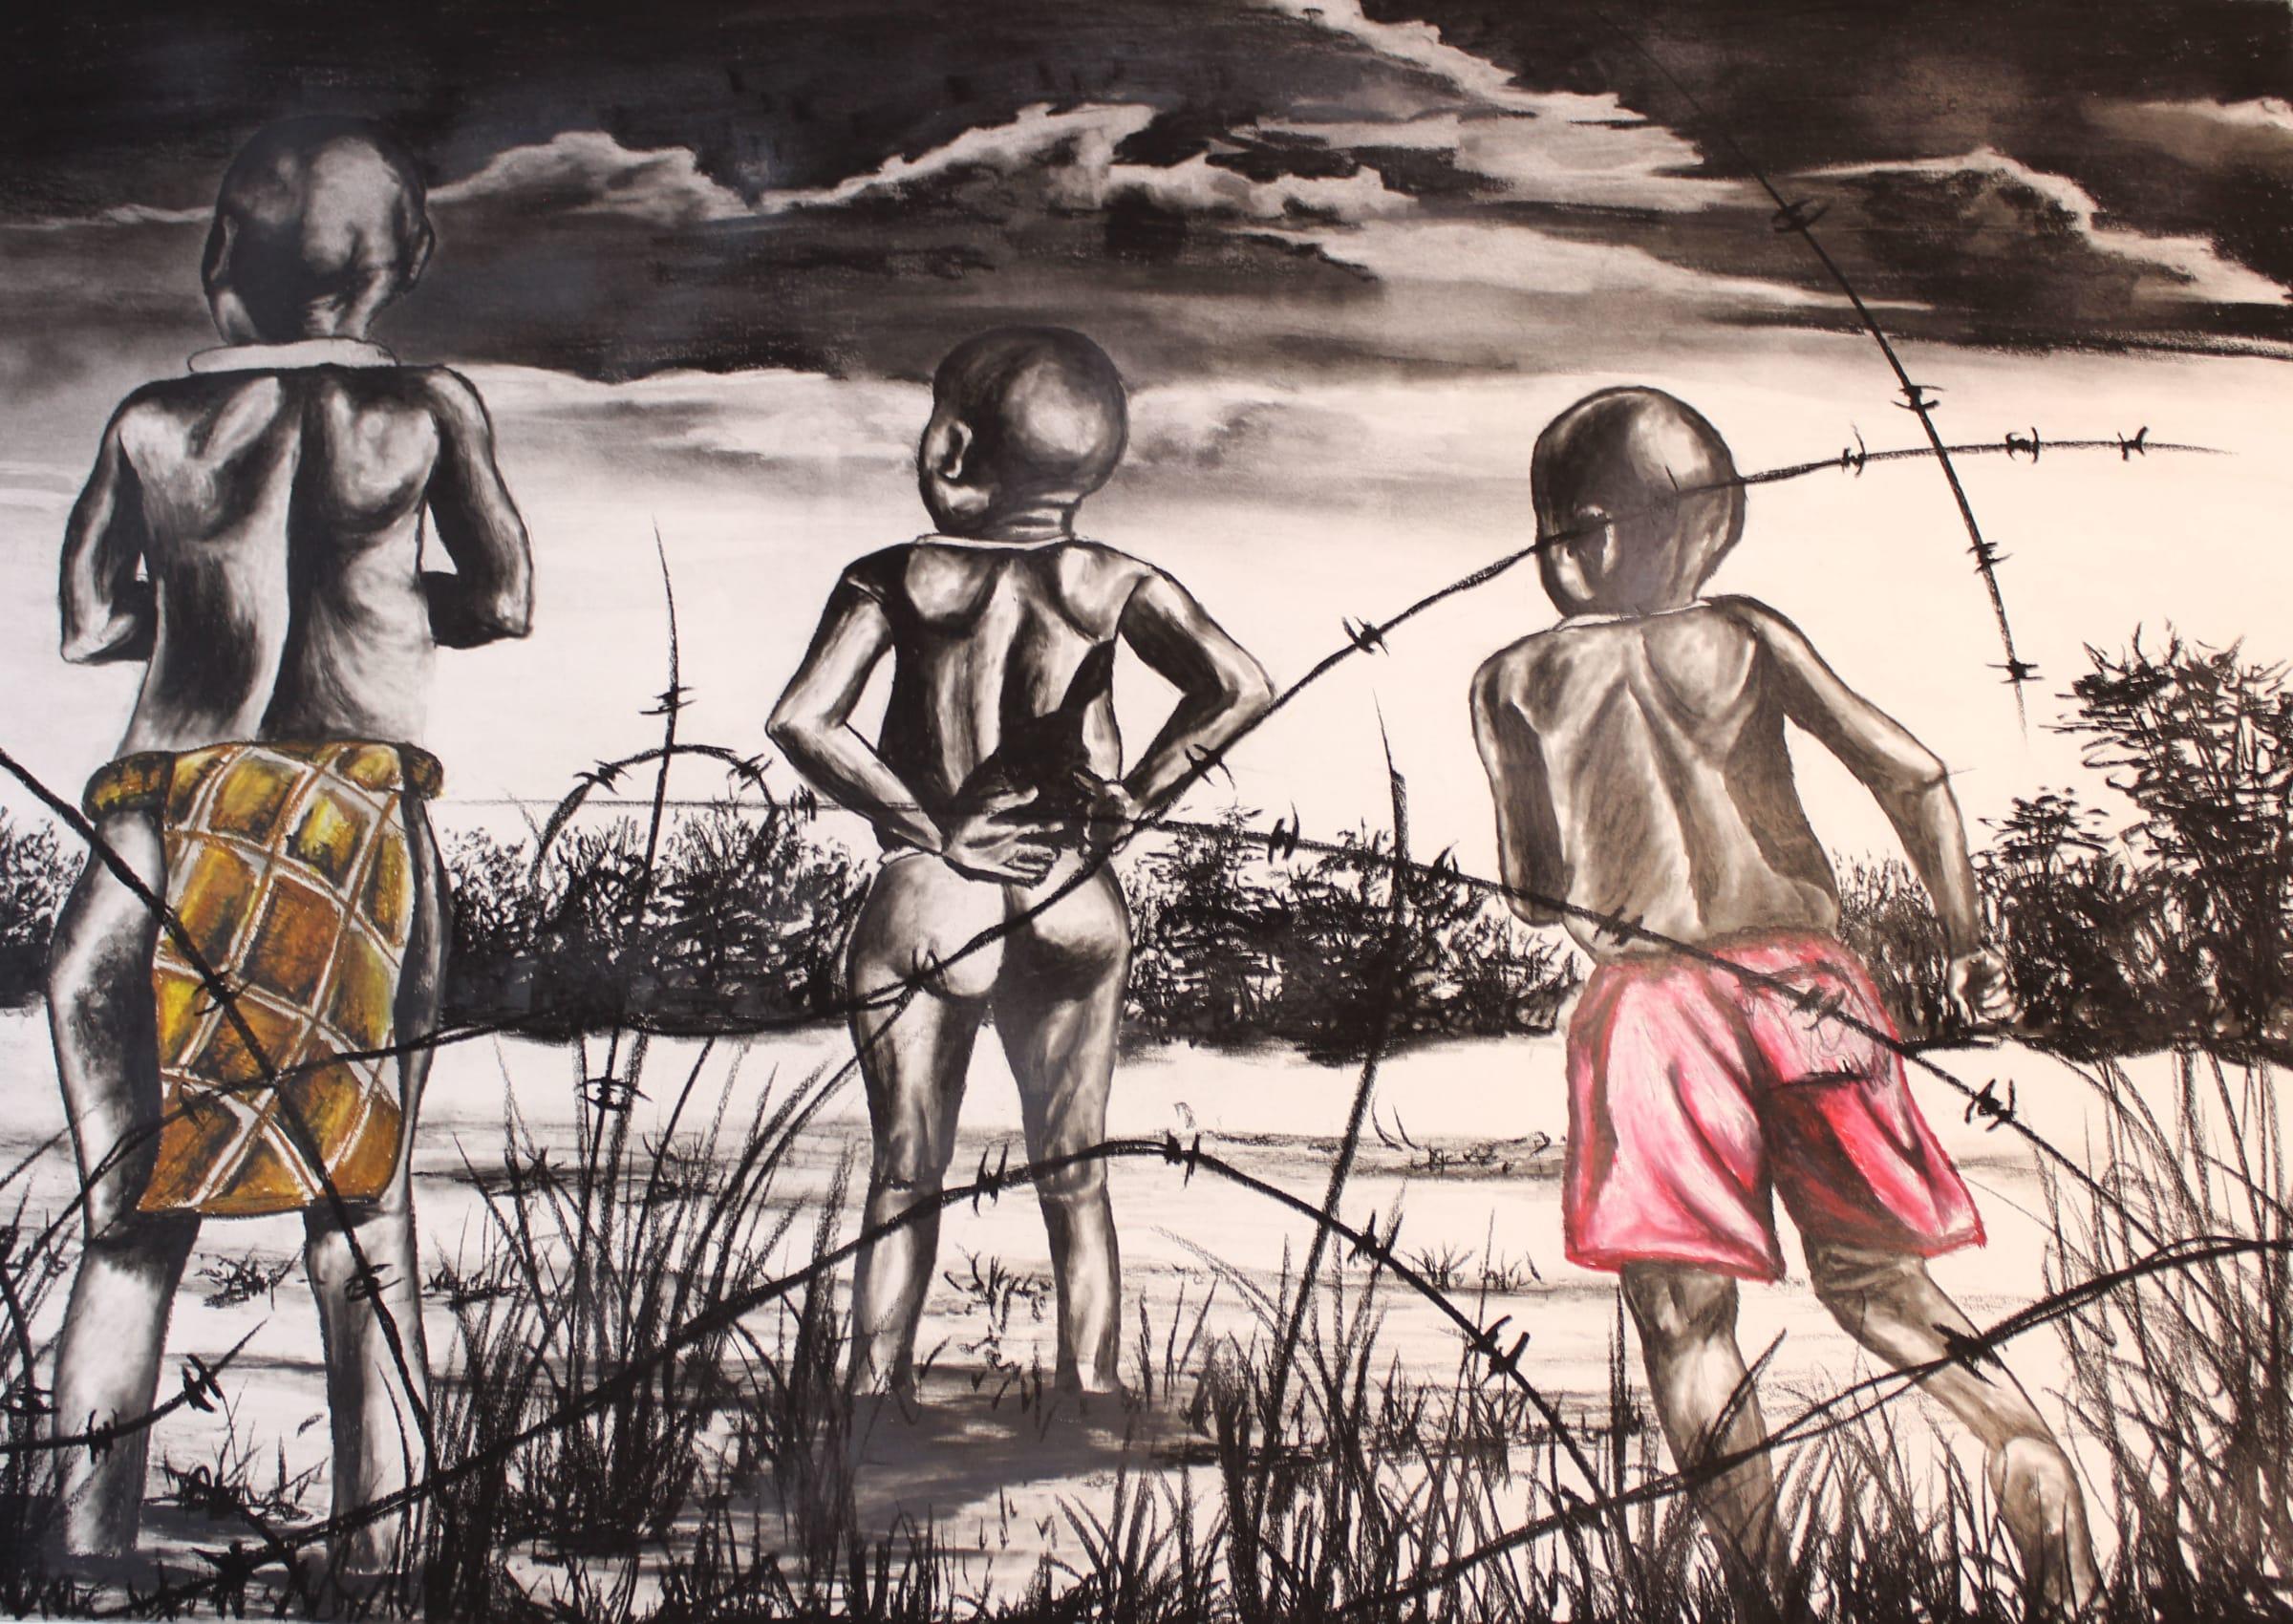 <span class=&#34;link fancybox-details-link&#34;><a href=&#34;/artists/98-walter-fumani-maluleke/works/1565-walter-fumani-maluleke-childhood-inspires-vuhlangi-bya-hlohlotela-2018/&#34;>View Detail Page</a></span><div class=&#34;artist&#34;><strong>Walter Fumani Maluleke </strong></div> <div class=&#34;title&#34;><em>Childhood Inspires (Vuhlangi Bya Hlohlotela)</em>, 2018</div> <div class=&#34;medium&#34;>Charcoal On Fabriano</div> <div class=&#34;dimensions&#34;>118.5cm x 84.5cm (135cm x 101cm framed)</div>